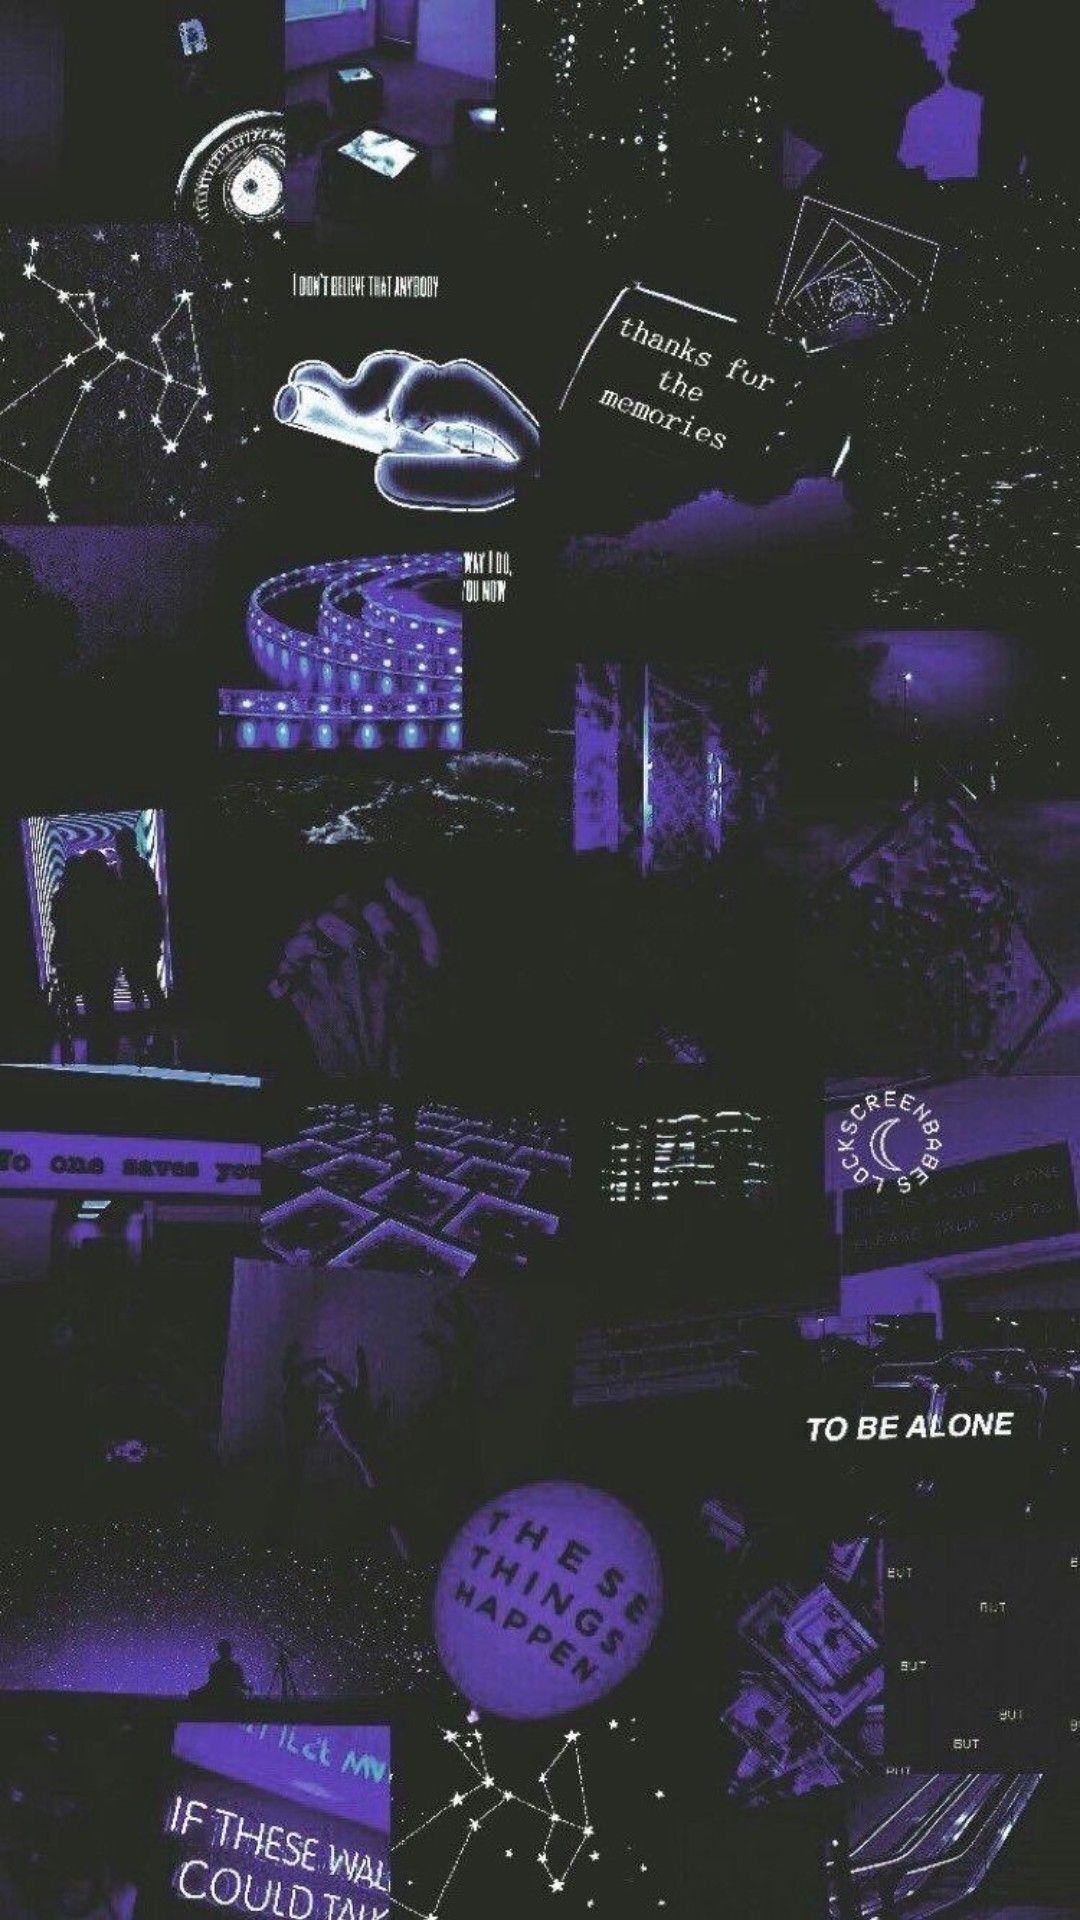 Aesthetic Black And Purple Artistic Desktop Hd Wallpapers In